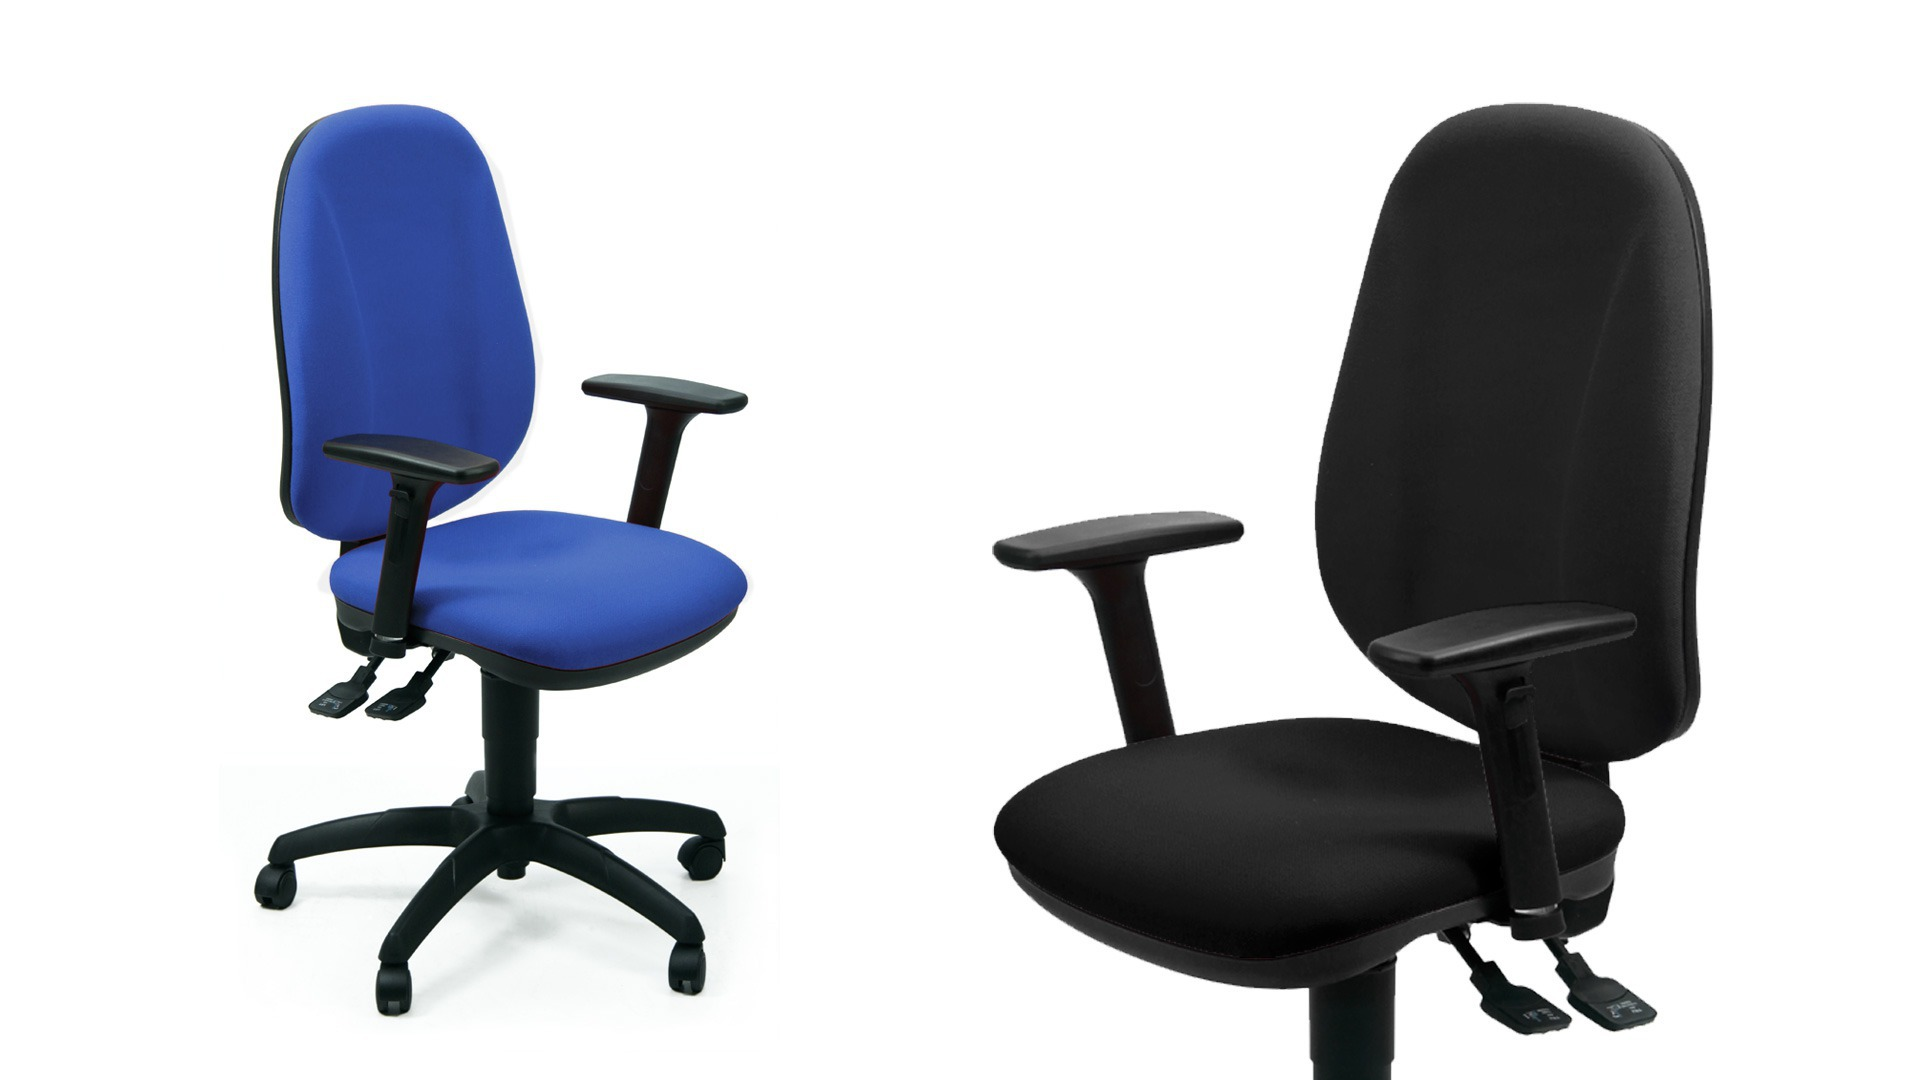 Pgigibr3d fumustore vendita online arredo ufficio for Vendita online mobili per ufficio